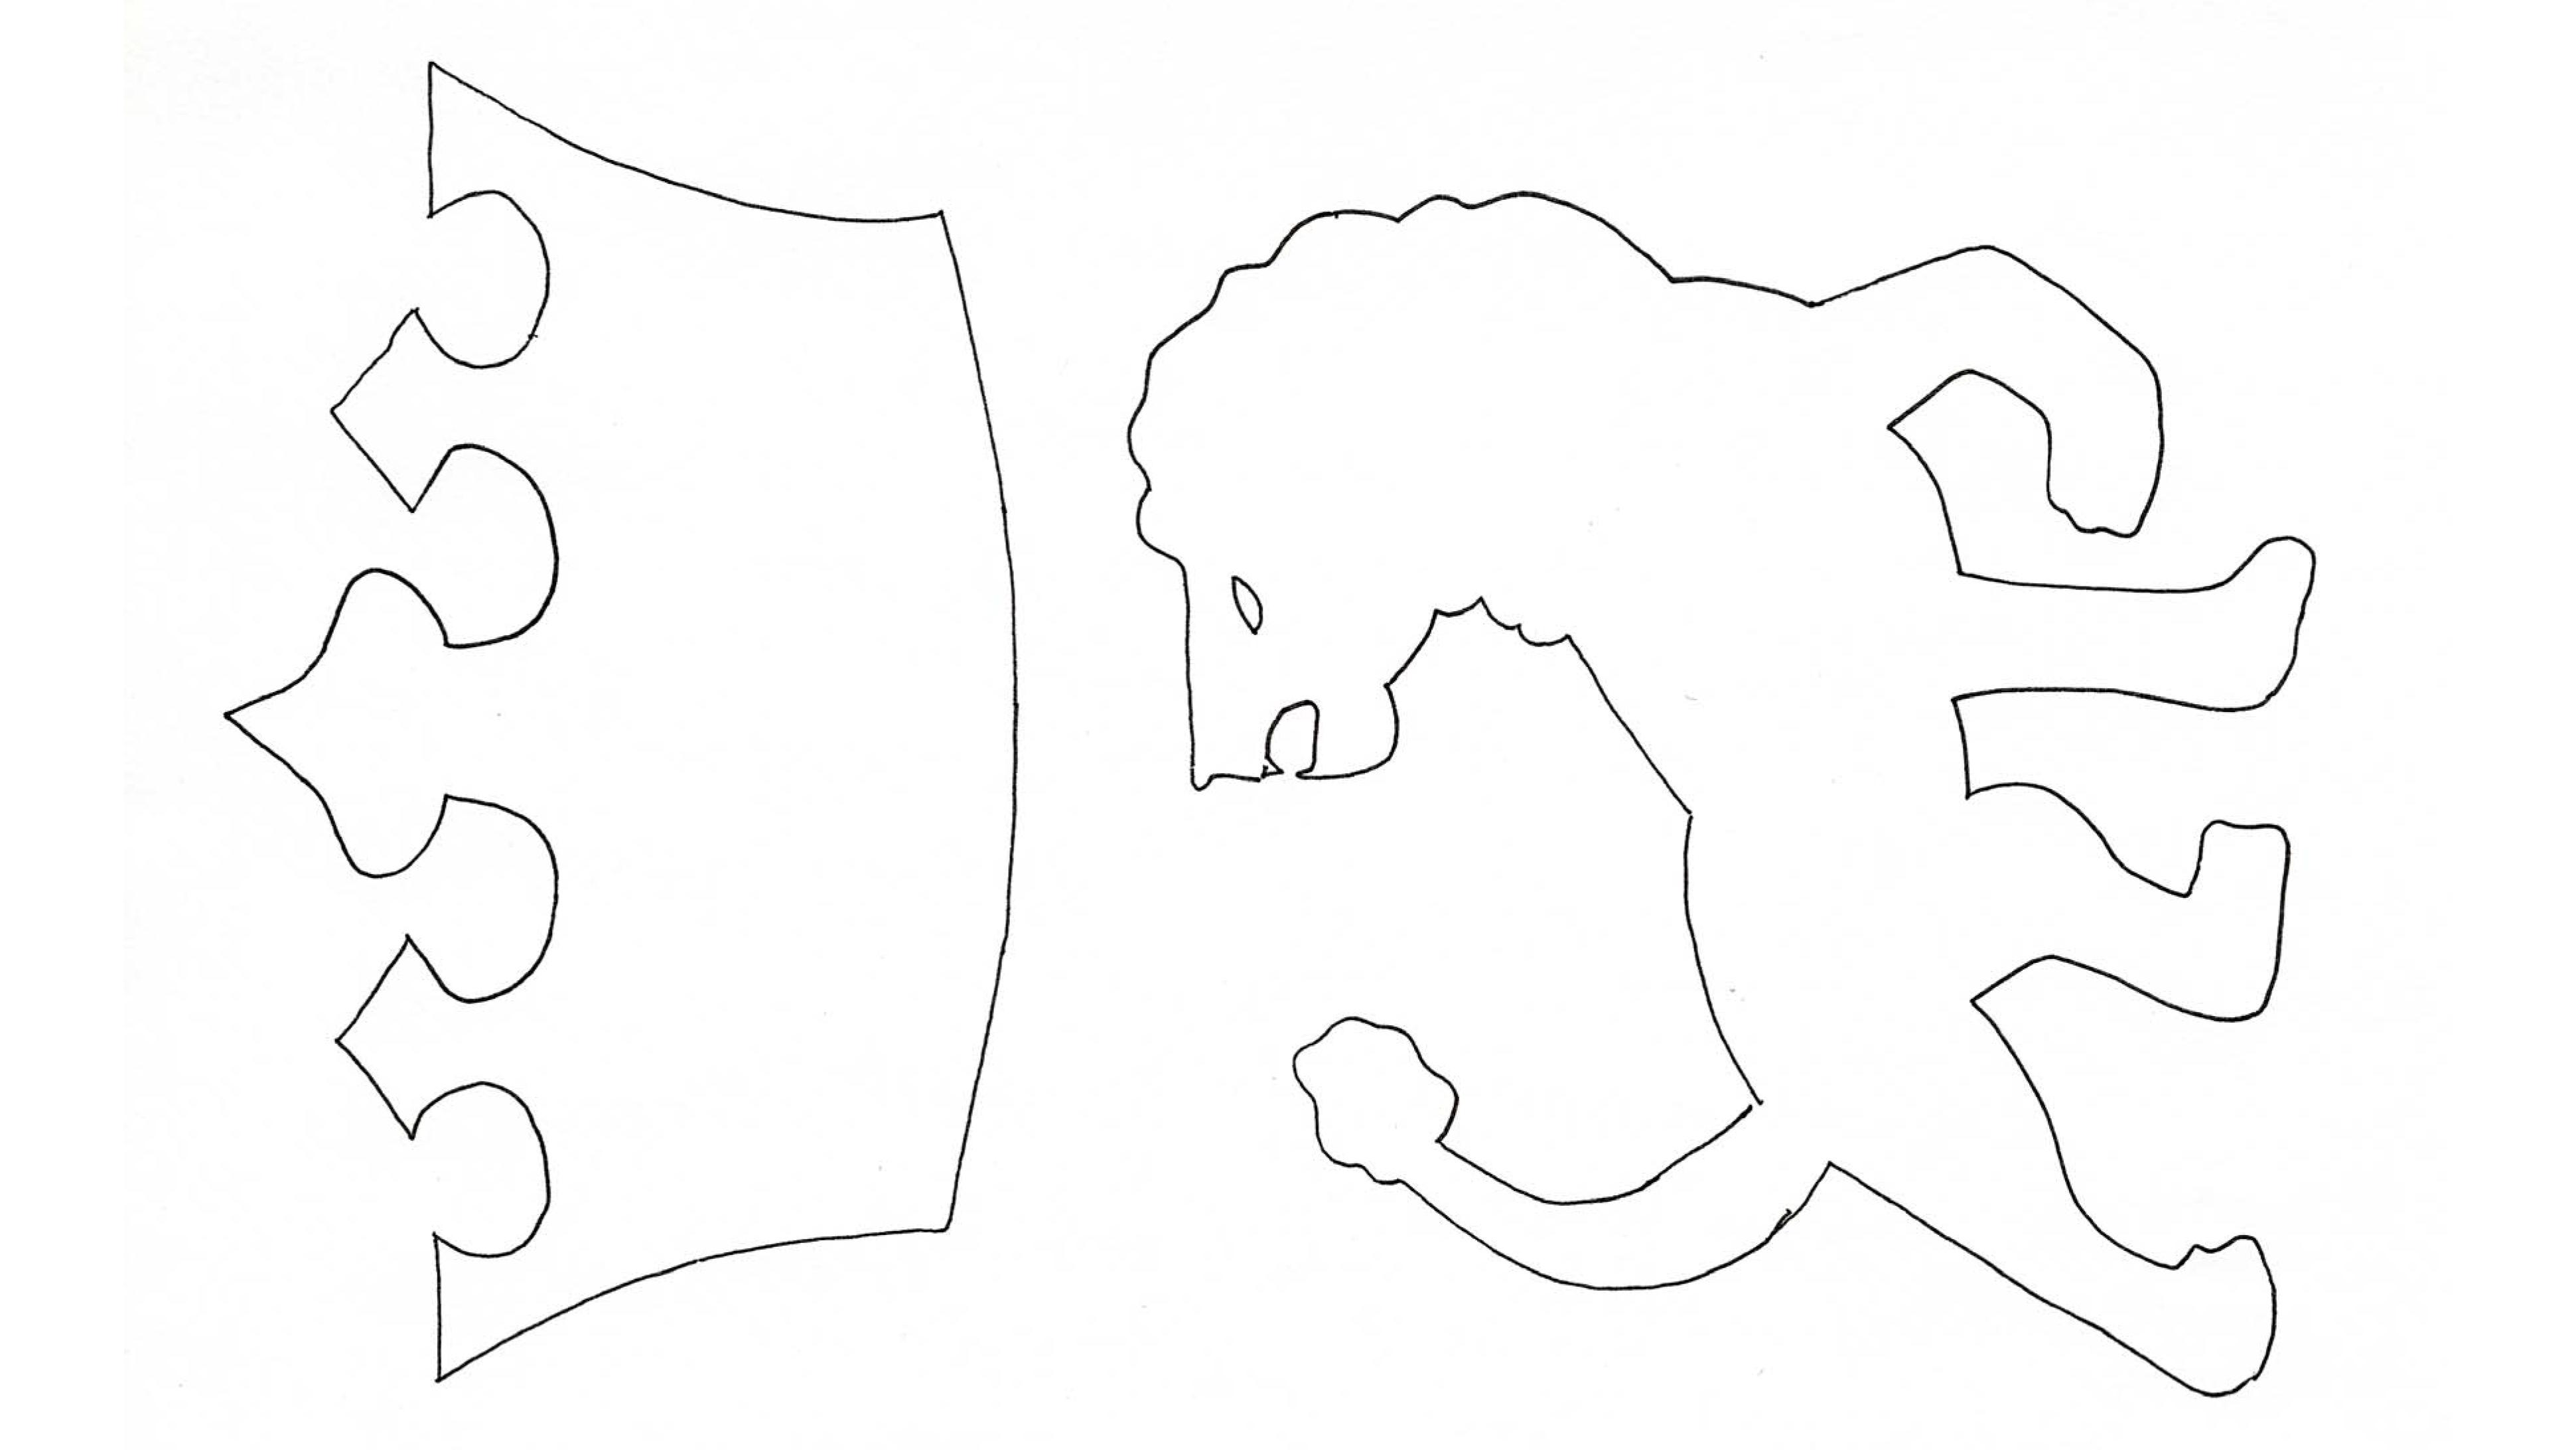 ritterschild famigros. Black Bedroom Furniture Sets. Home Design Ideas